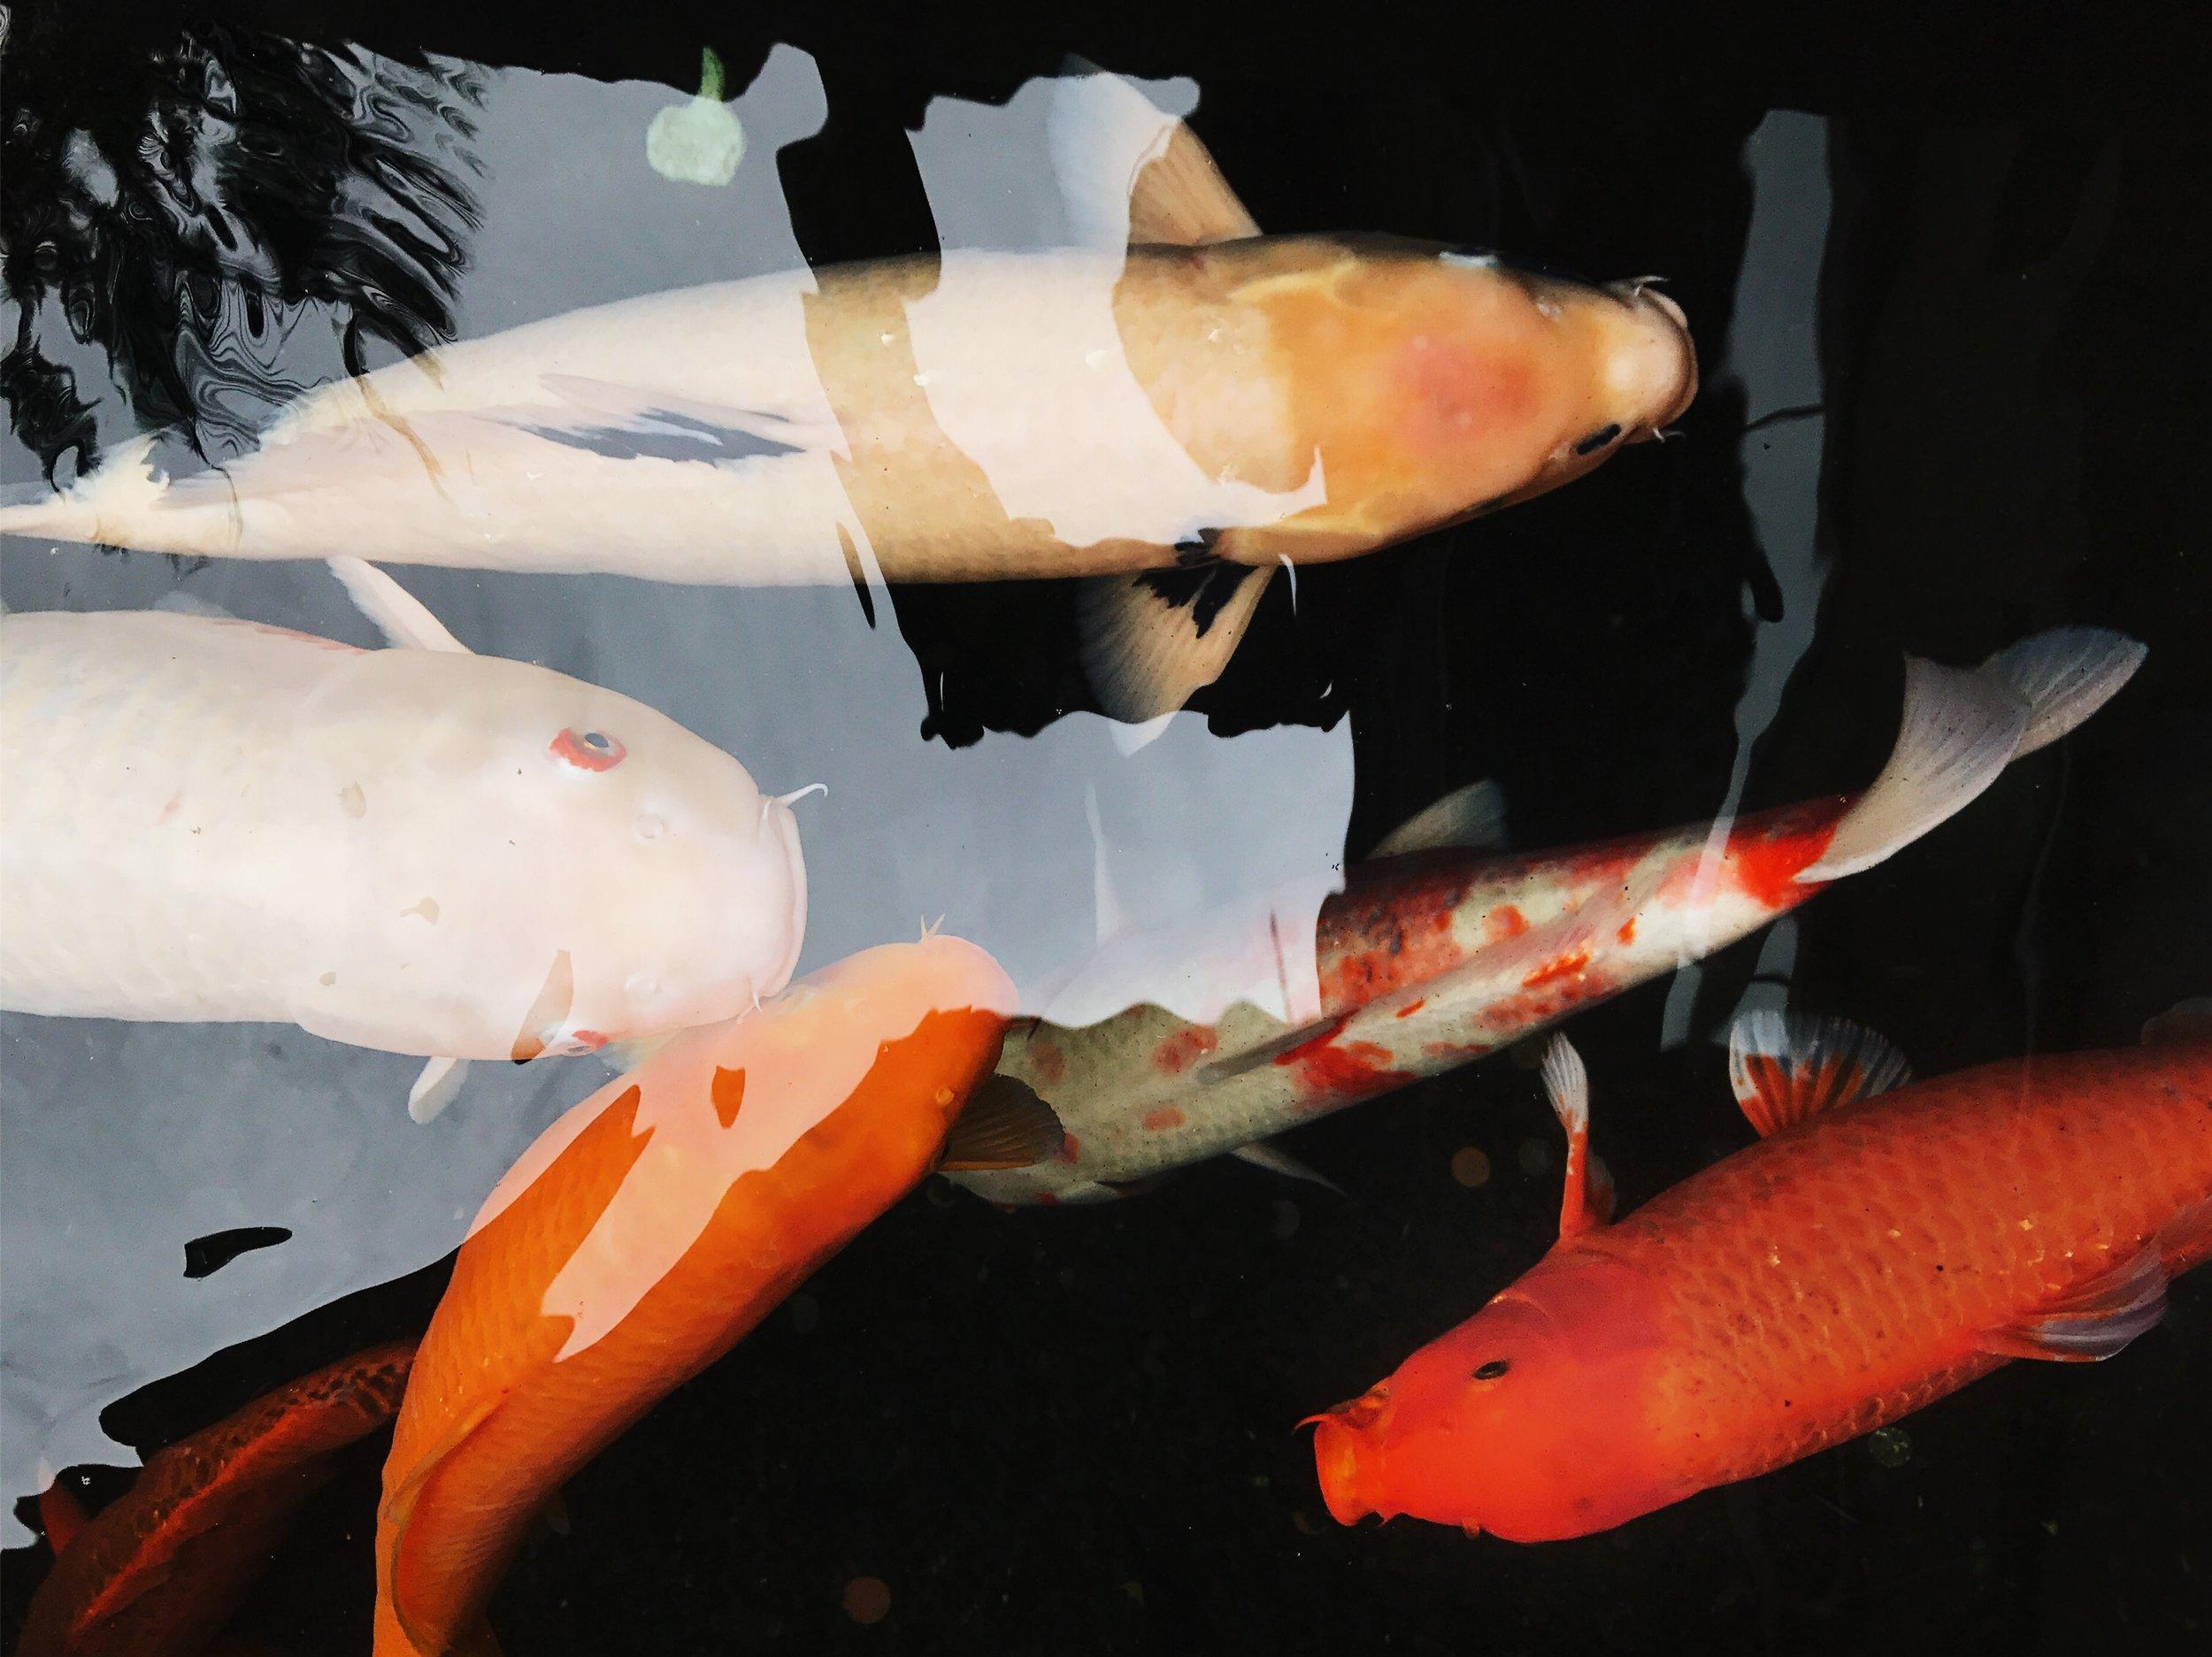 Hawaii-trip-koi-fish-by-Atlanta-photographer-Chanel-French-22